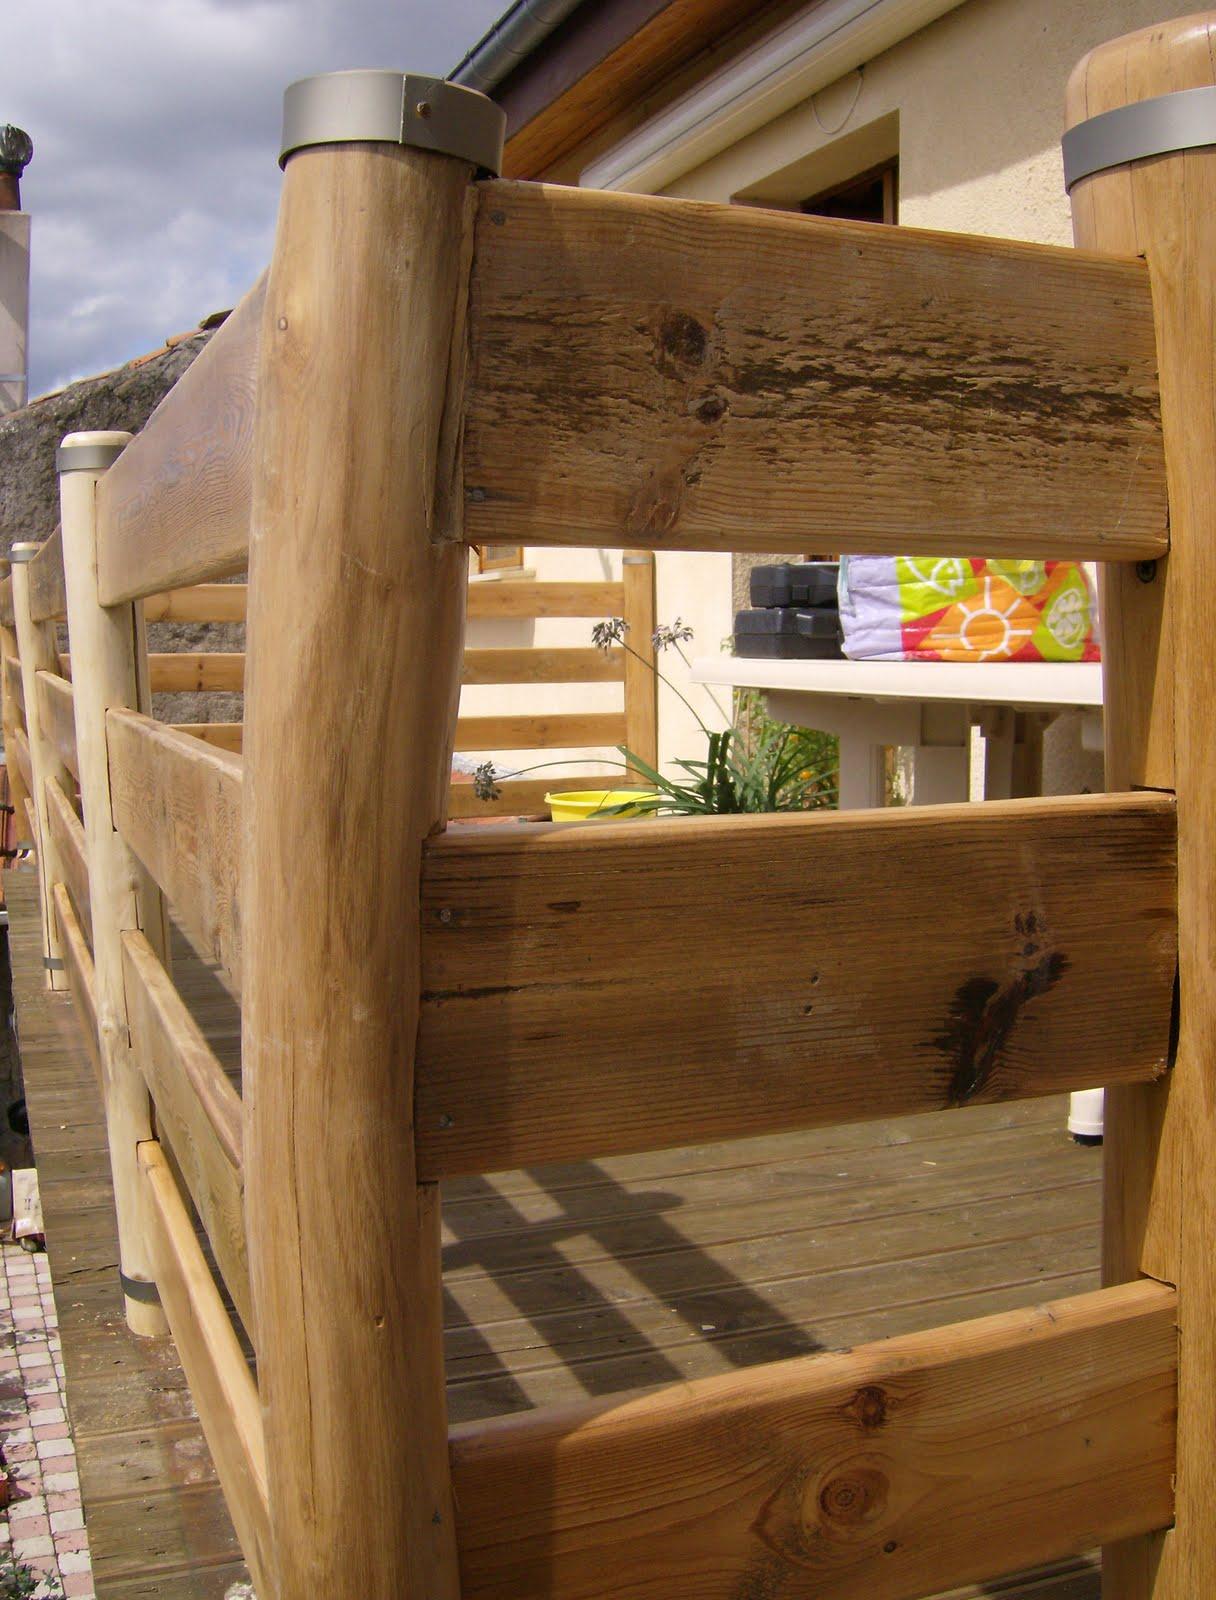 andr hieulle rambarde de terrasse. Black Bedroom Furniture Sets. Home Design Ideas